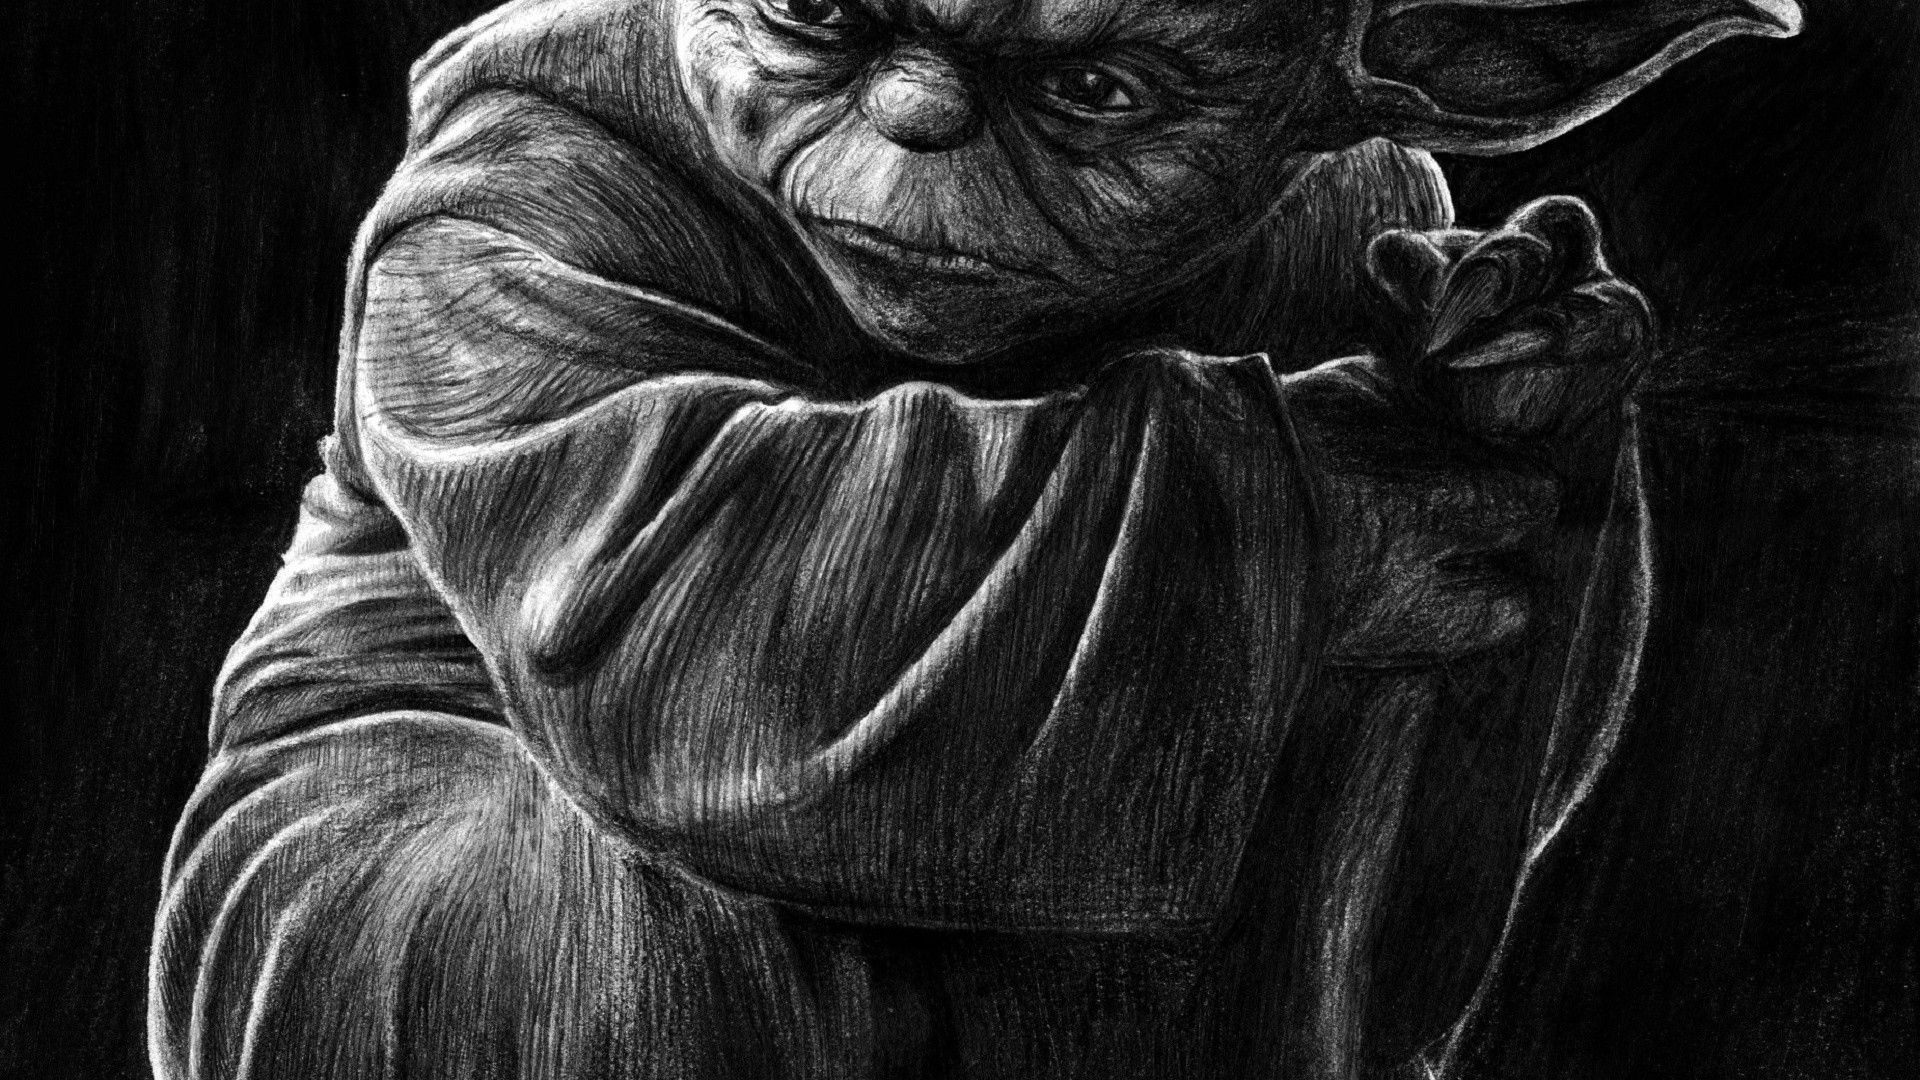 Star Wars Yoda Wallpapers Top Free Star Wars Yoda Backgrounds Wallpaperaccess